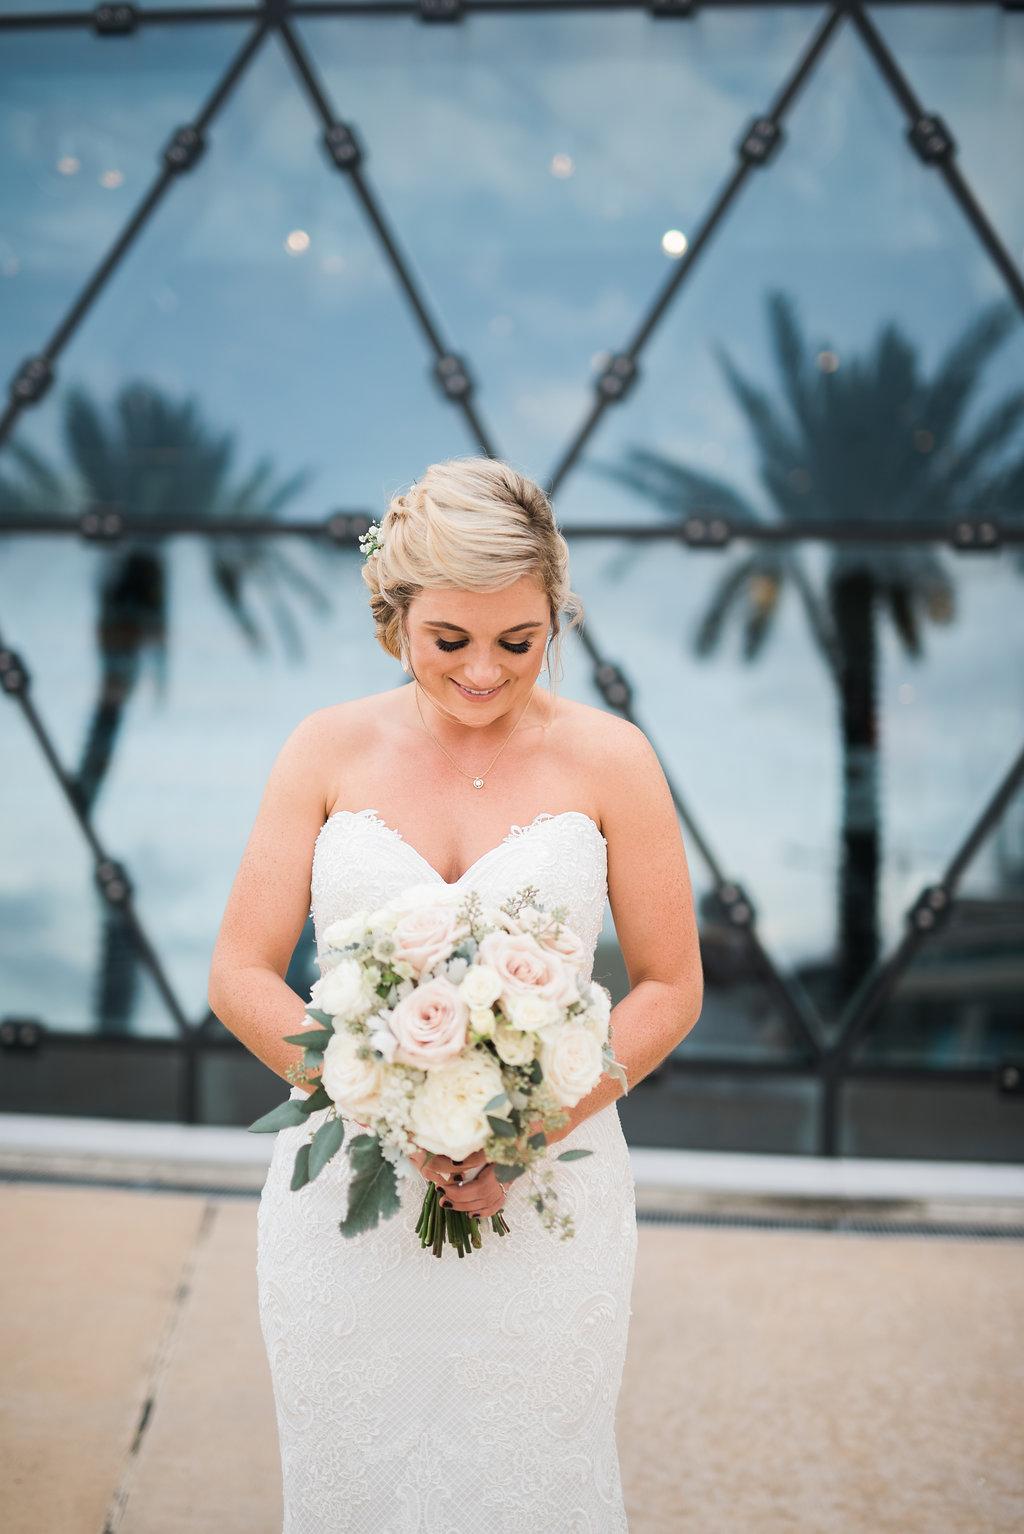 Blush and White Wedding Bouquet - Minimalist Wedding - Tampa Wedding Venue